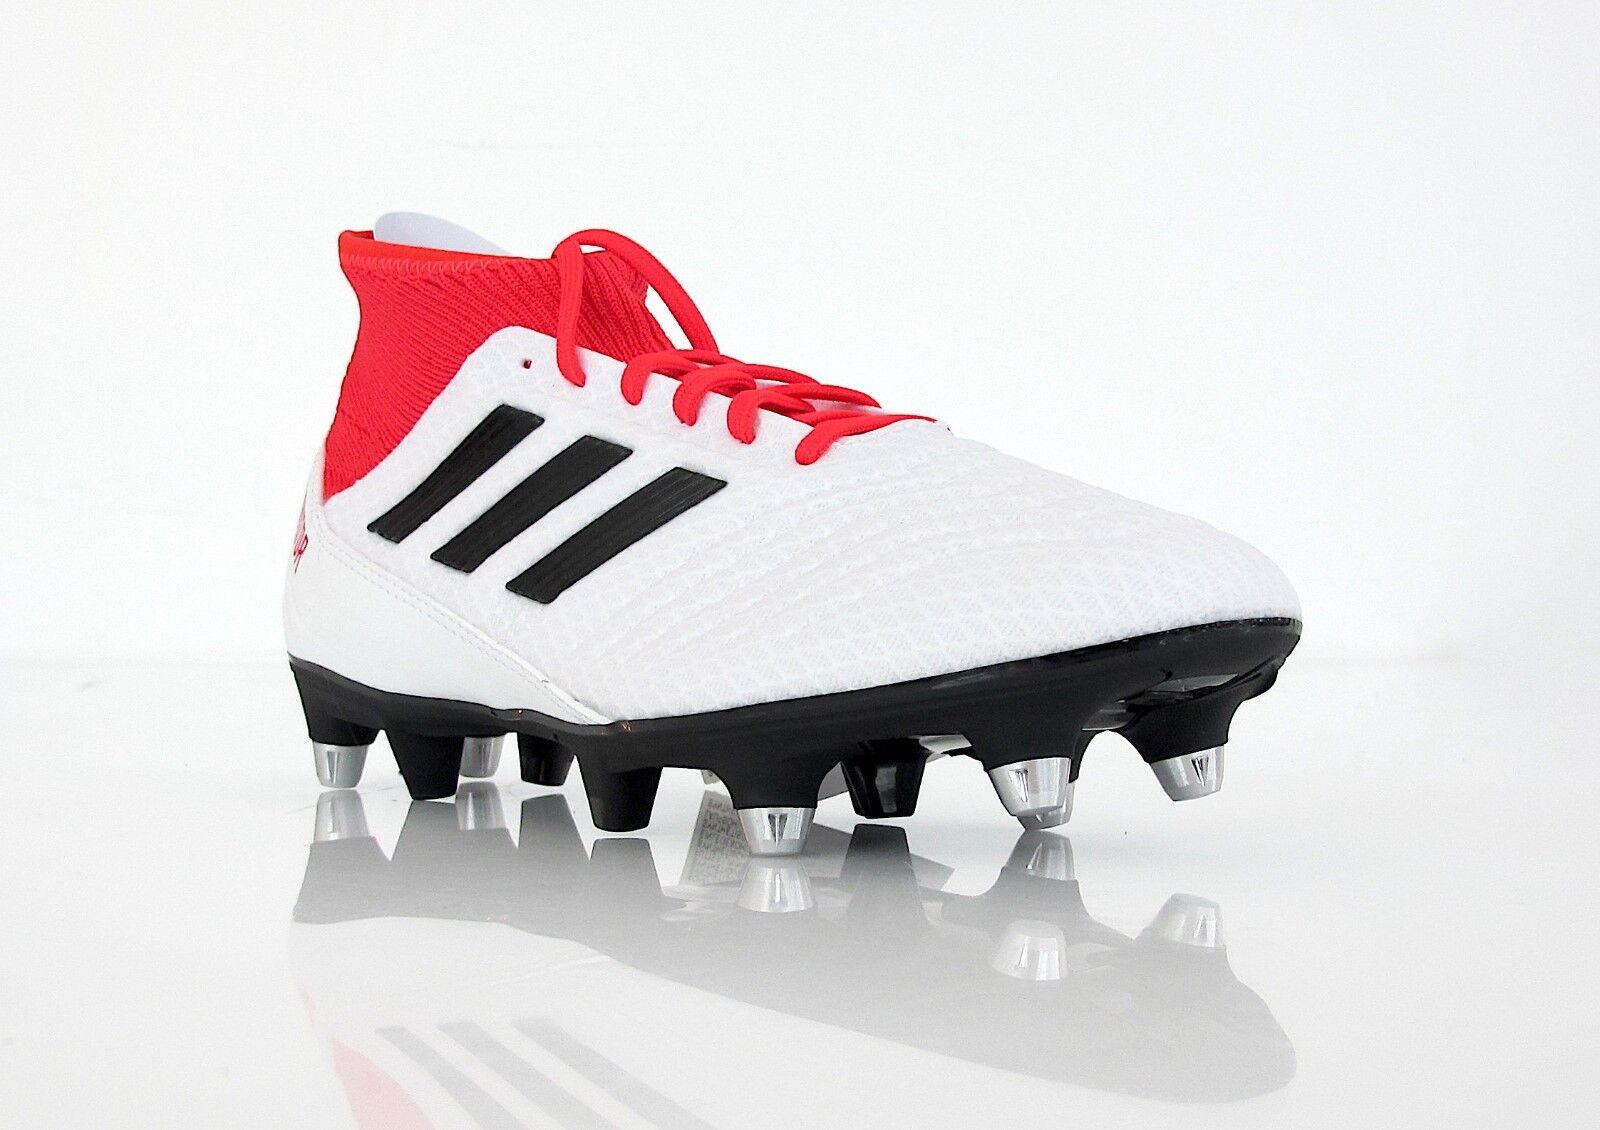 Adidas Adidas Adidas Schuhe Fußball protator 18.3 SG CP9305 col.bianco rot Januar 2018  | Zarte  4b9f1a